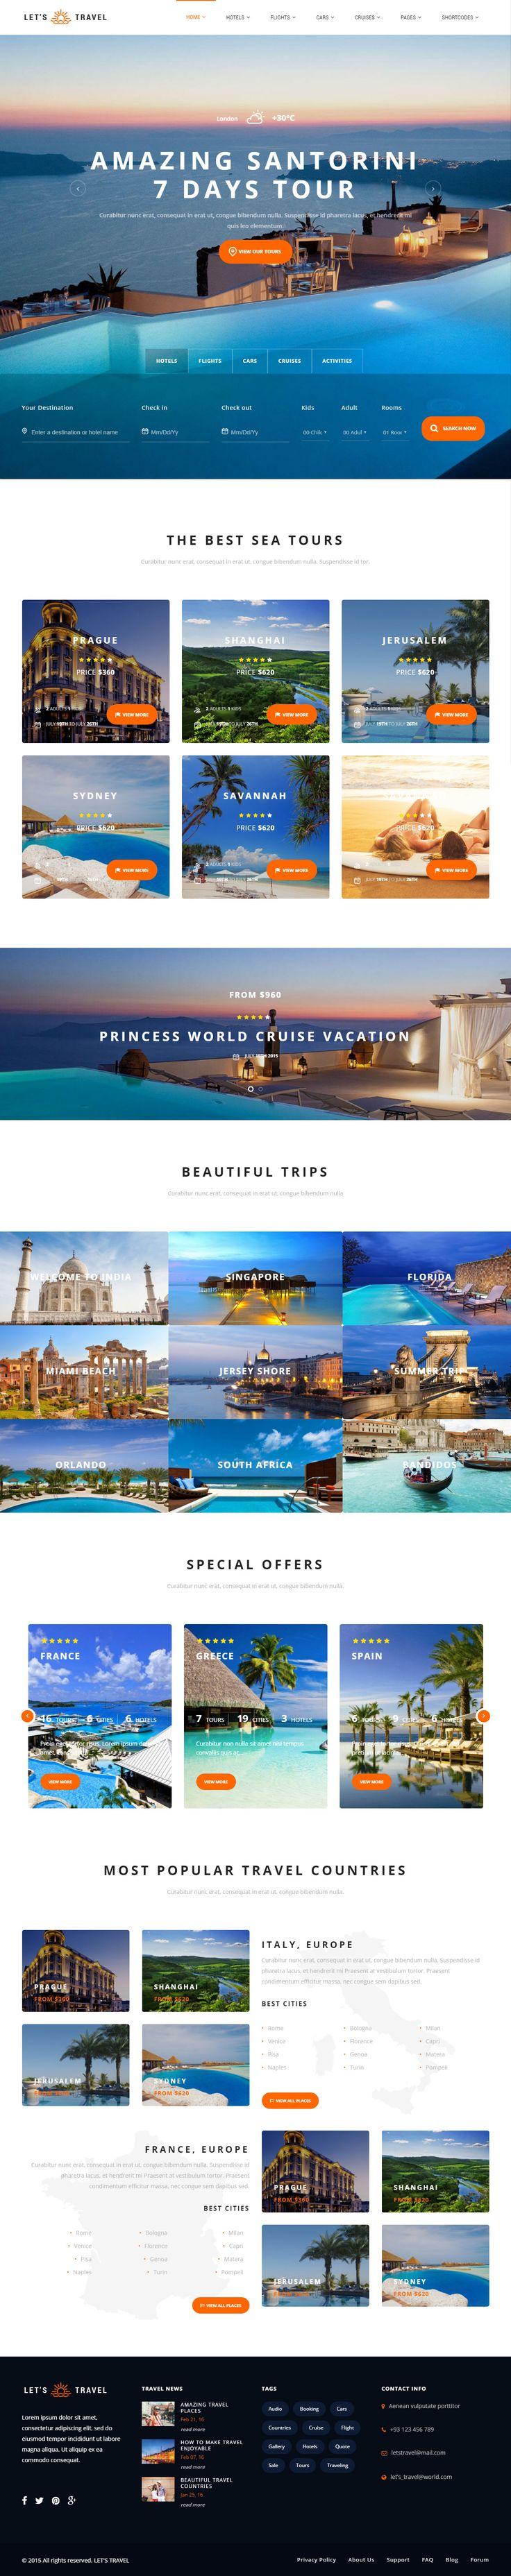 Let's Travel is Premium Responsive Retina Parallax #WordPress #Travel Theme. #VideoBackground. Bootstrap 3. Visual Composer. Test free demo at: http://www.responsivemiracle.com/lets-travel-premium-responsive-travel-booking-wordpress-theme/